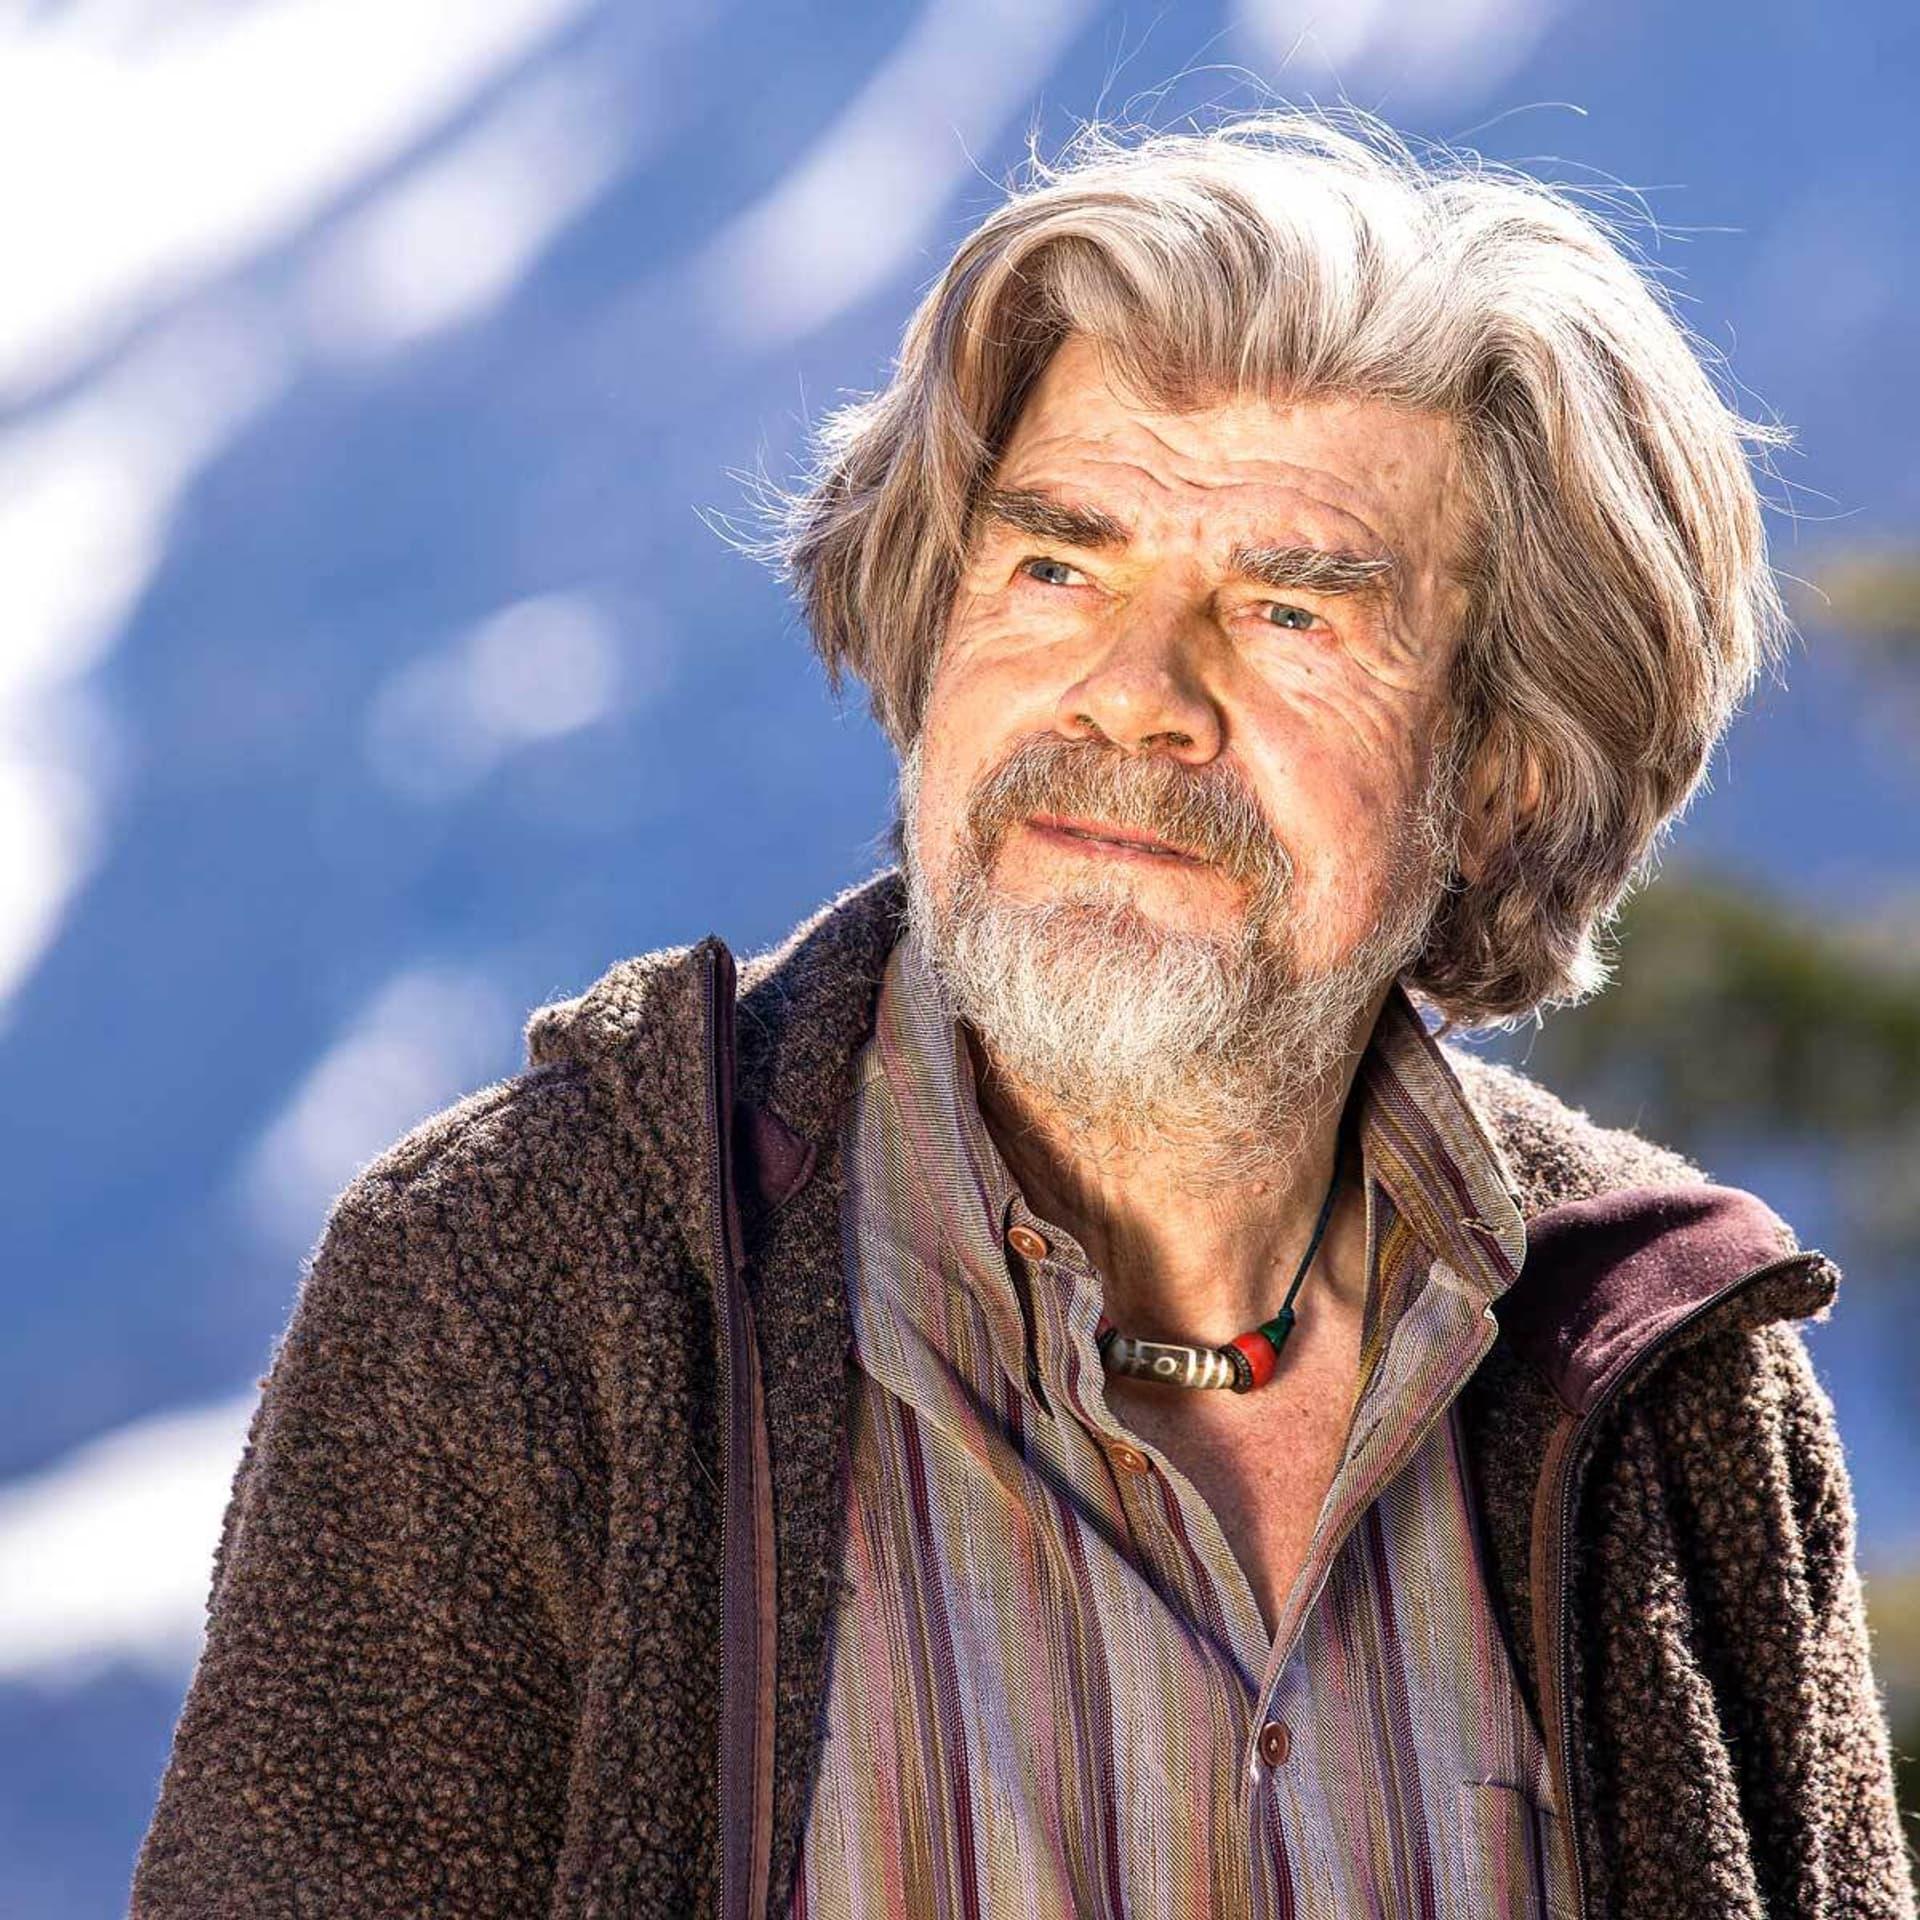 Bergsteiger Reinhold Messner im Porträt